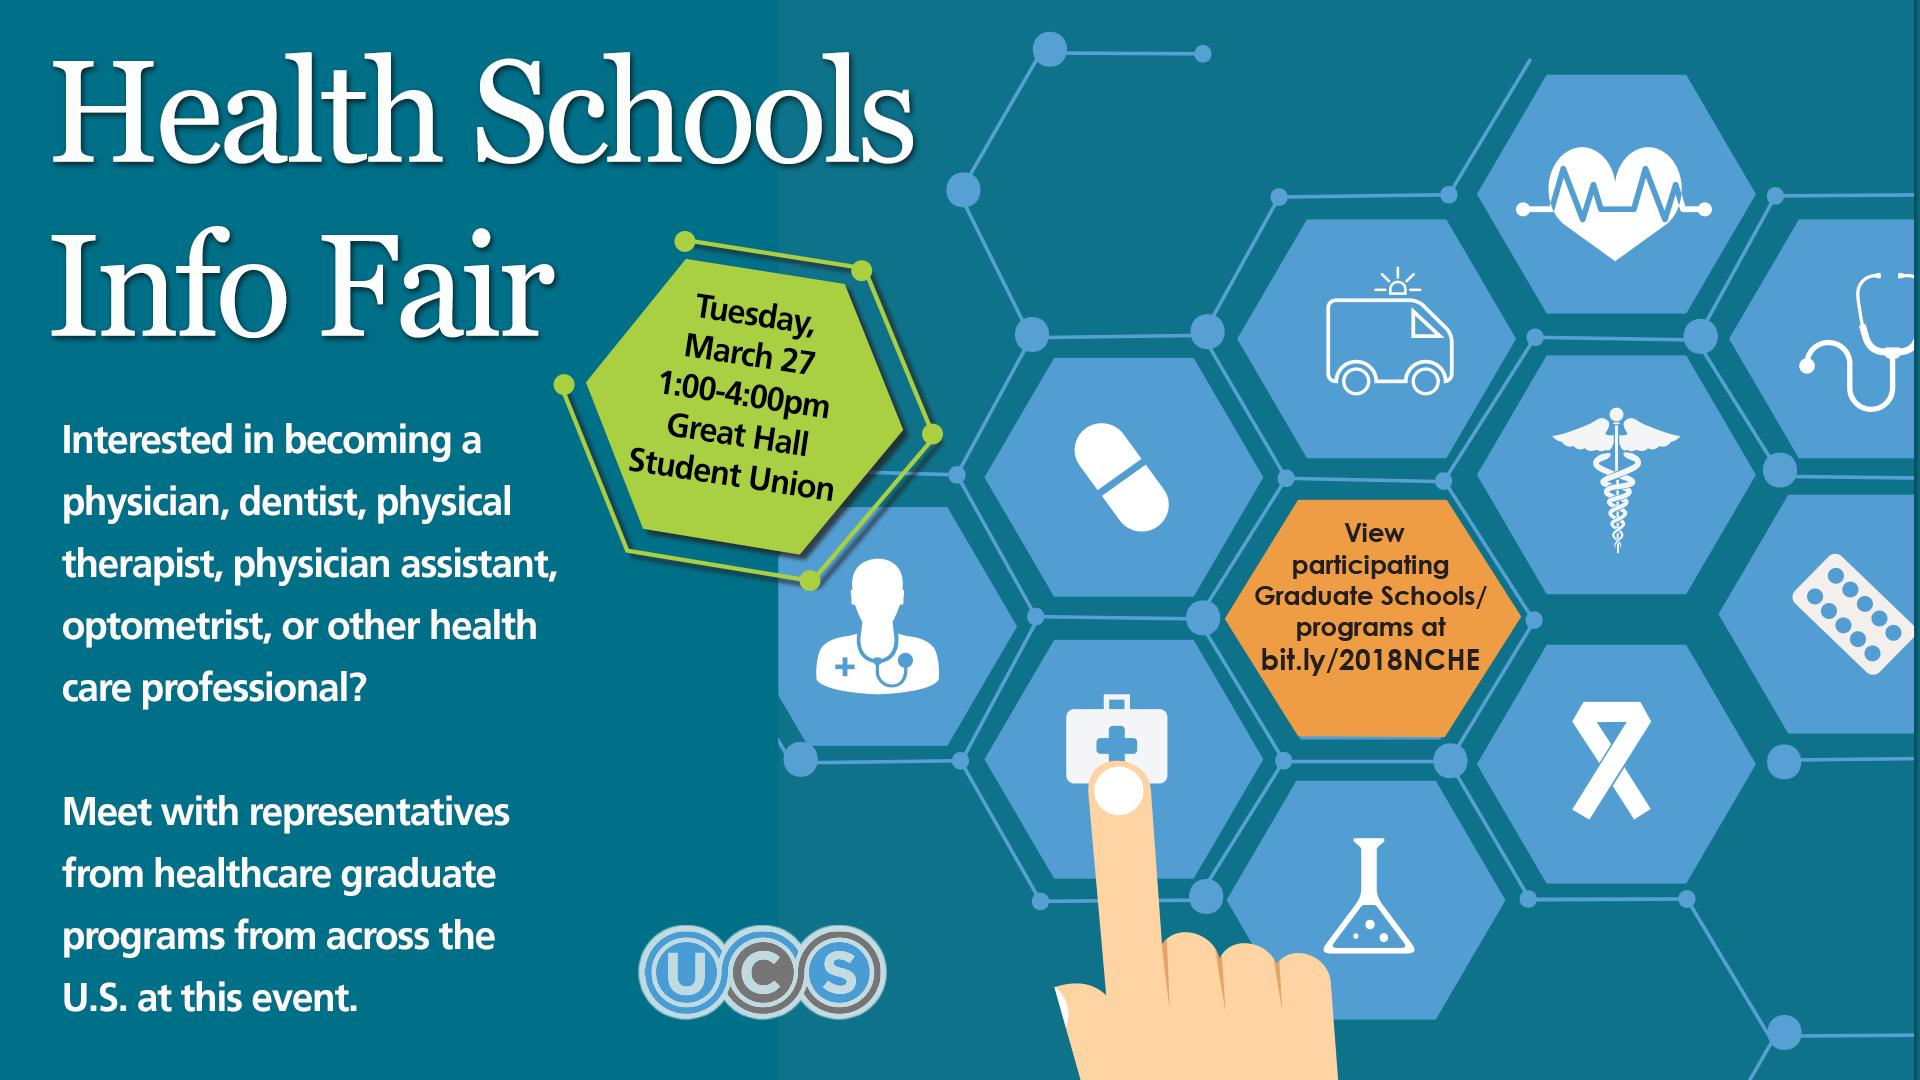 Health Schools Info Fair